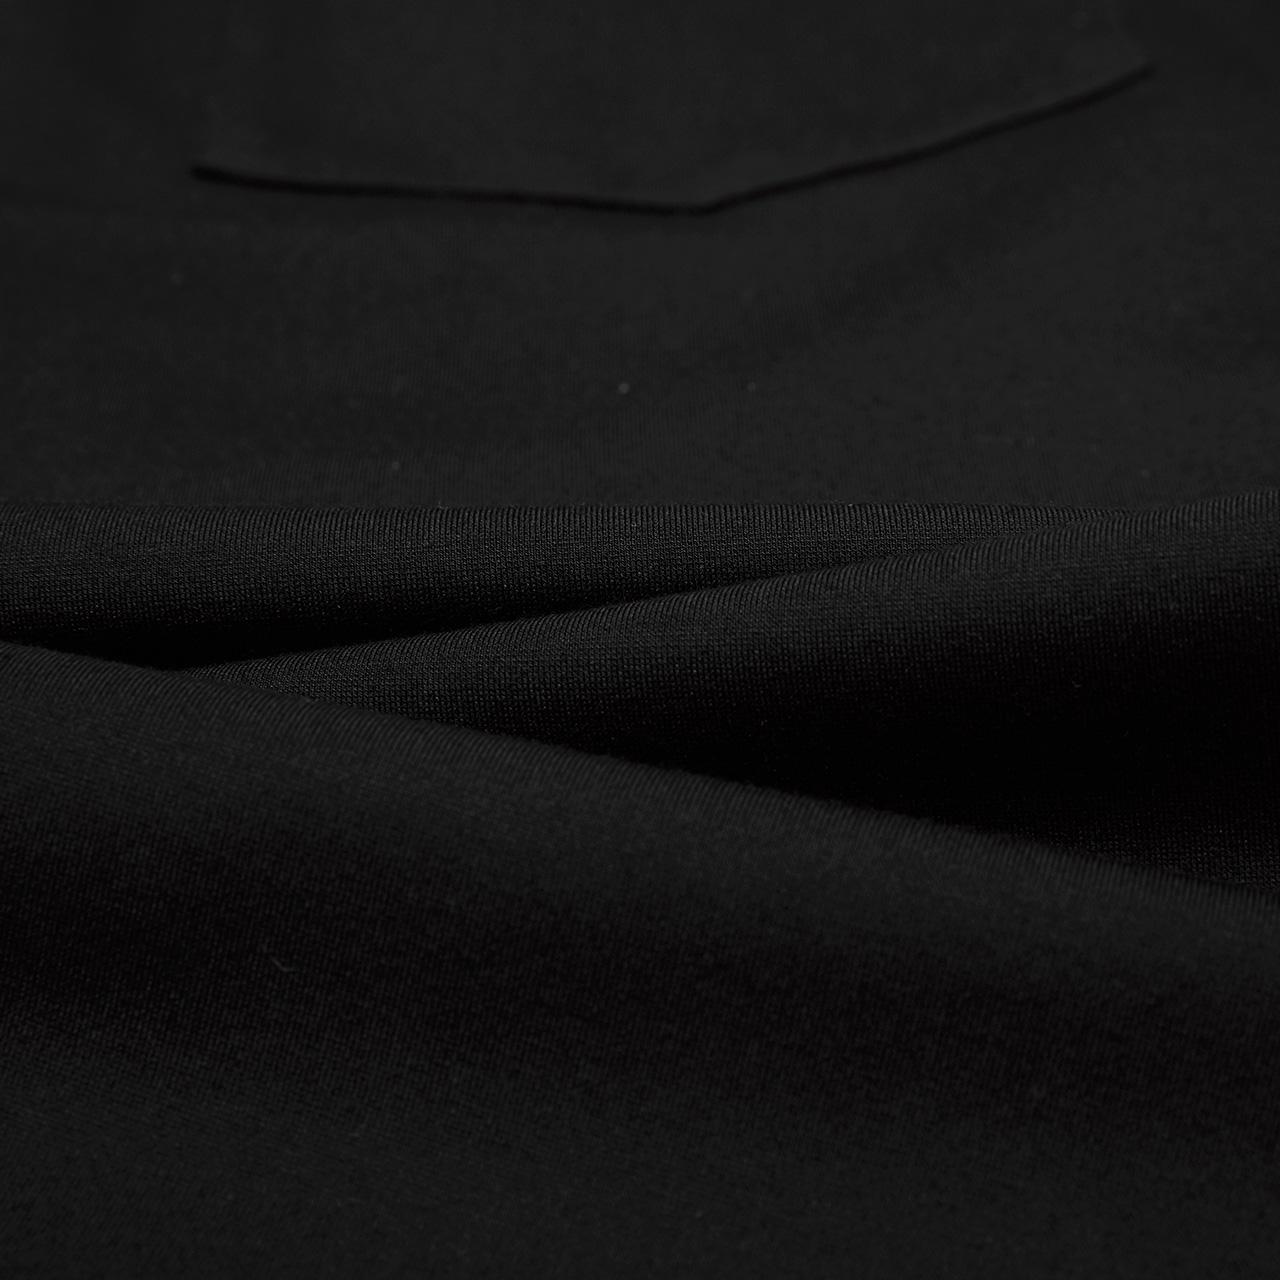 LB 韩版束脚裤潮流运动卫裤宽松小脚休闲裤子 串标裤子男 Lilbetter